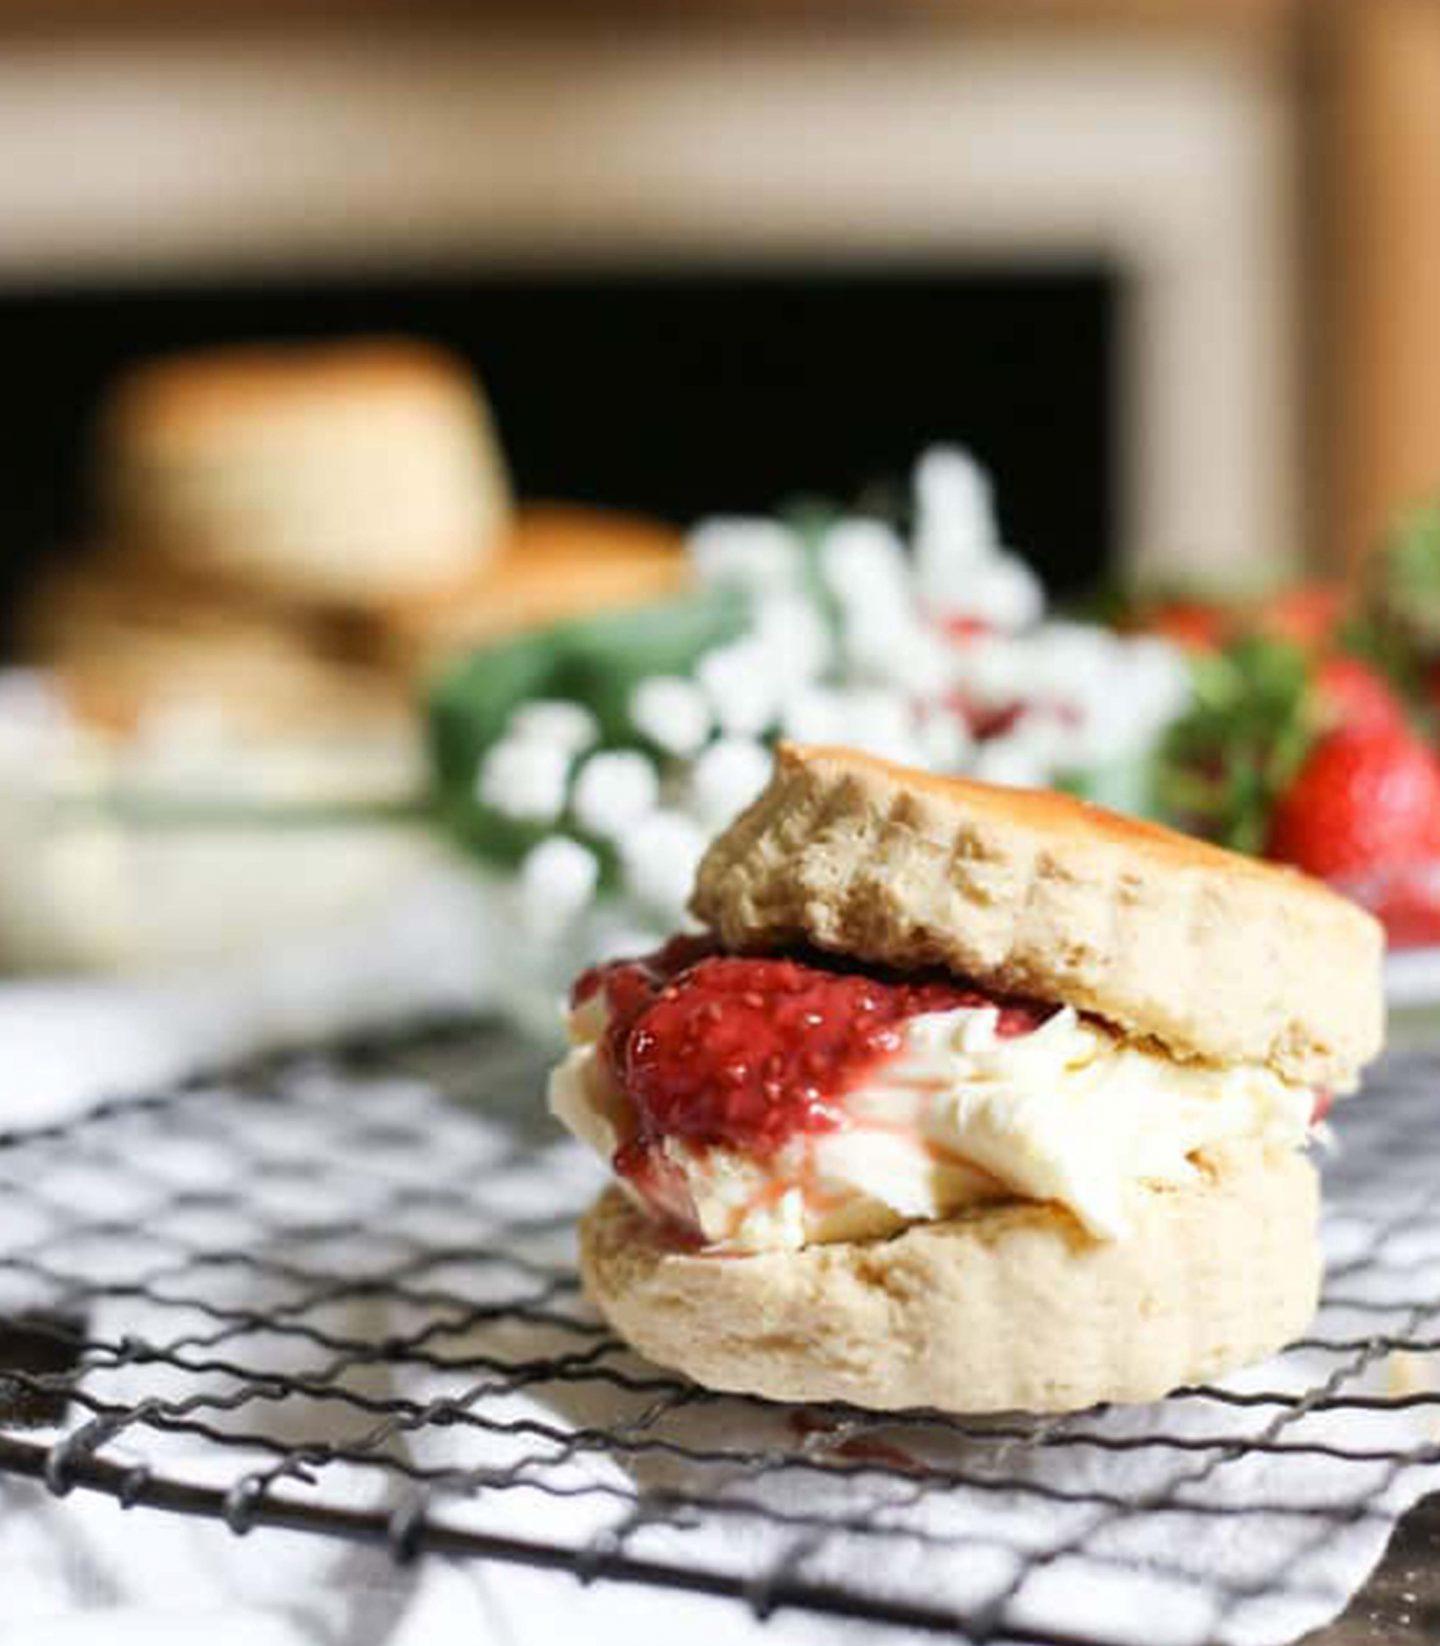 Strawberry & Cream Scones